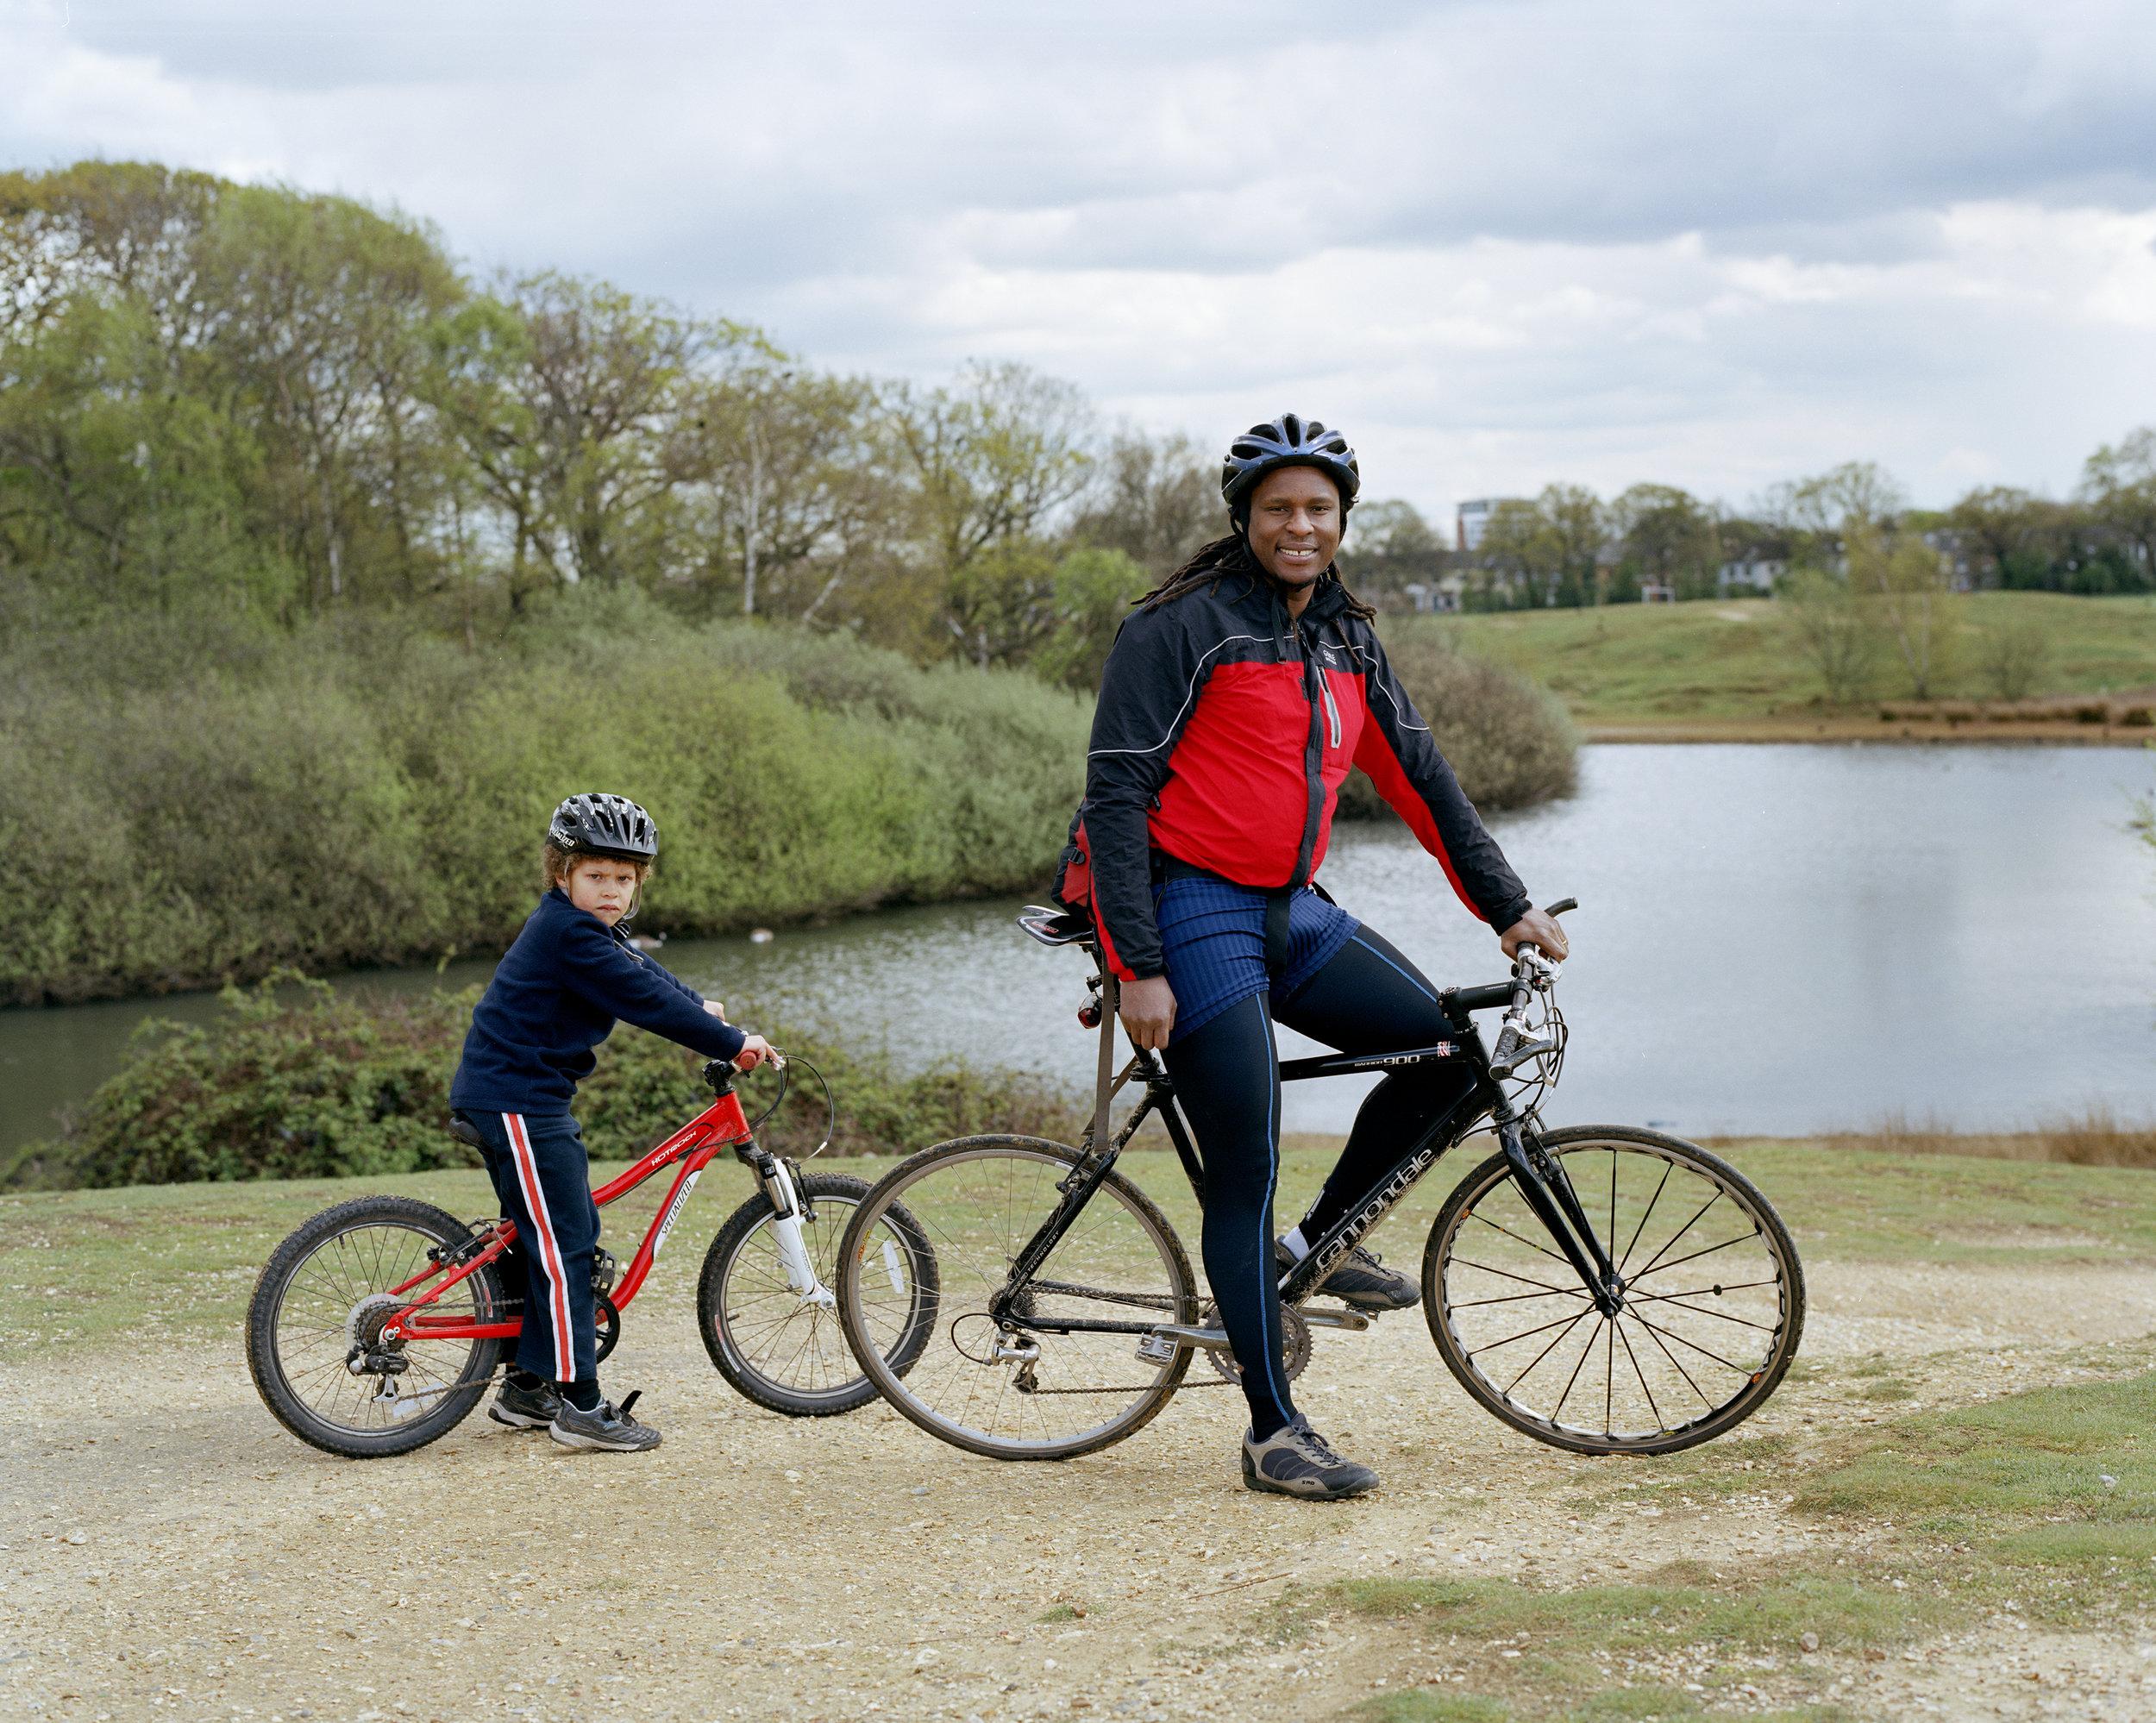 wanstead biciclete.jpg